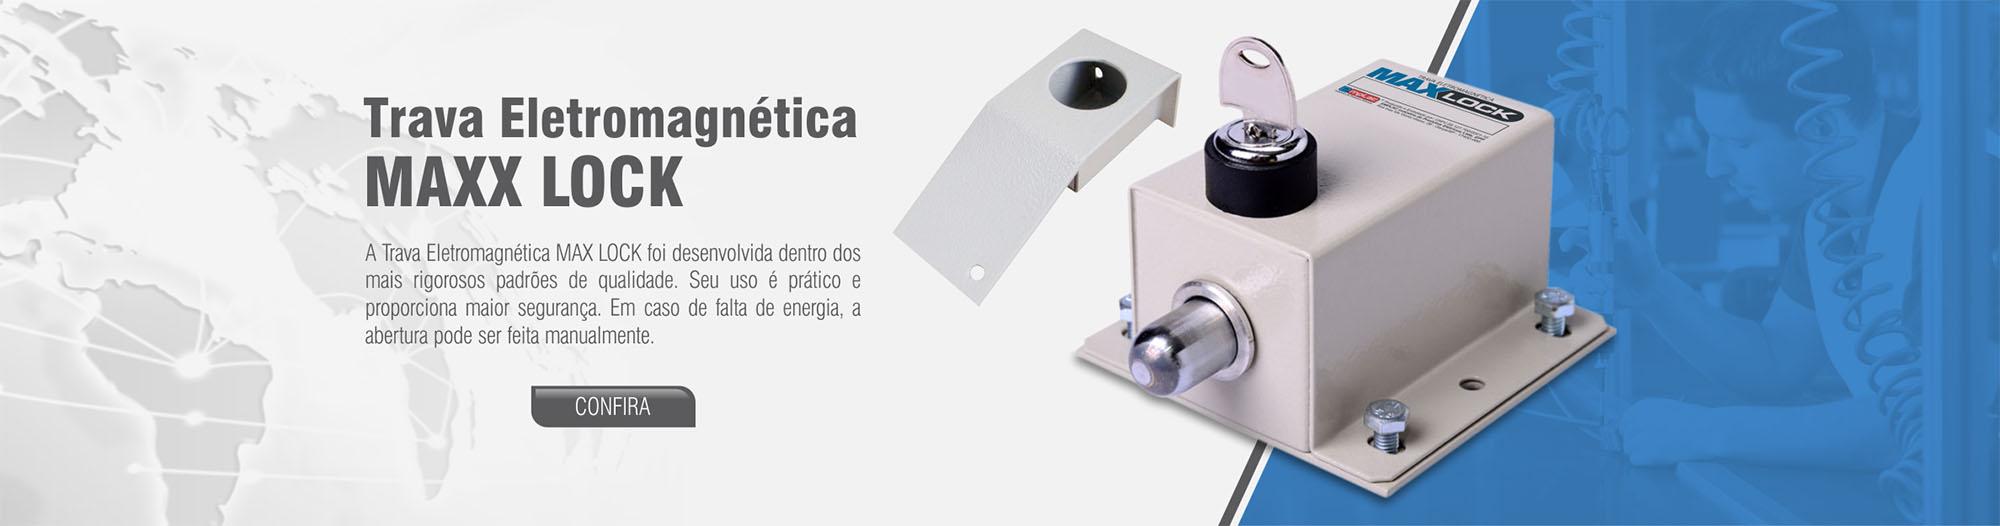 Trava Maxx Lock